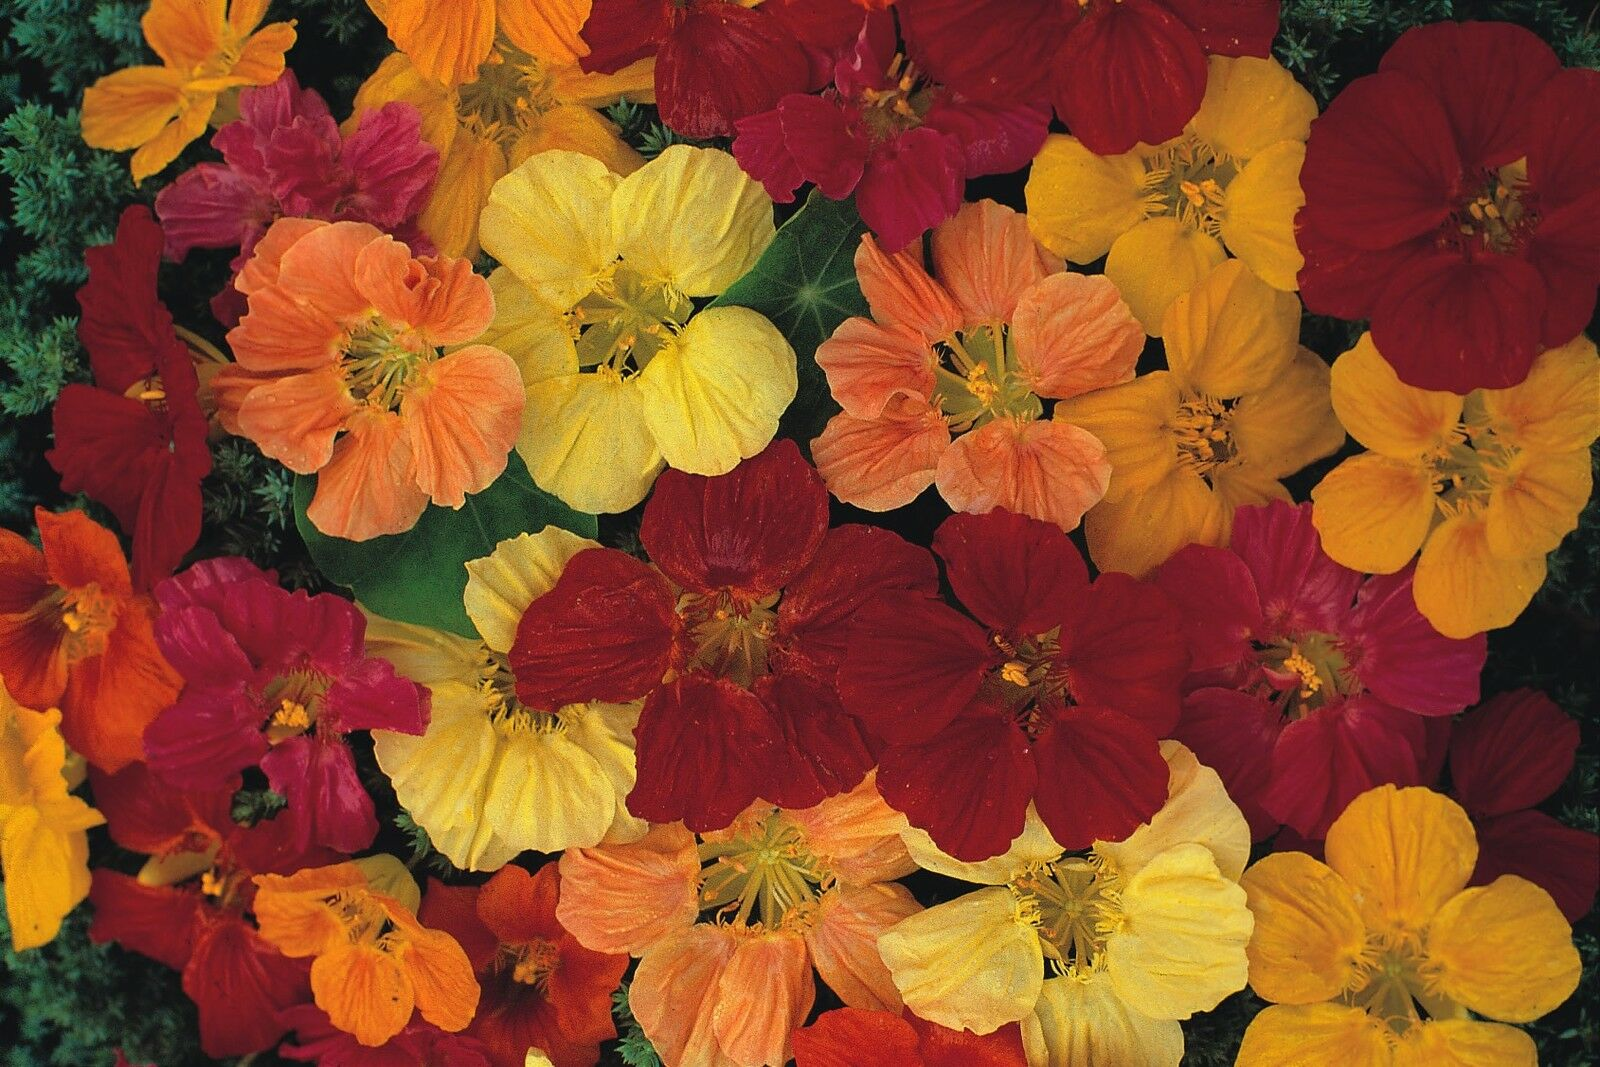 Large Gleam Mixed 1000 Seeds Nasturtium Flower